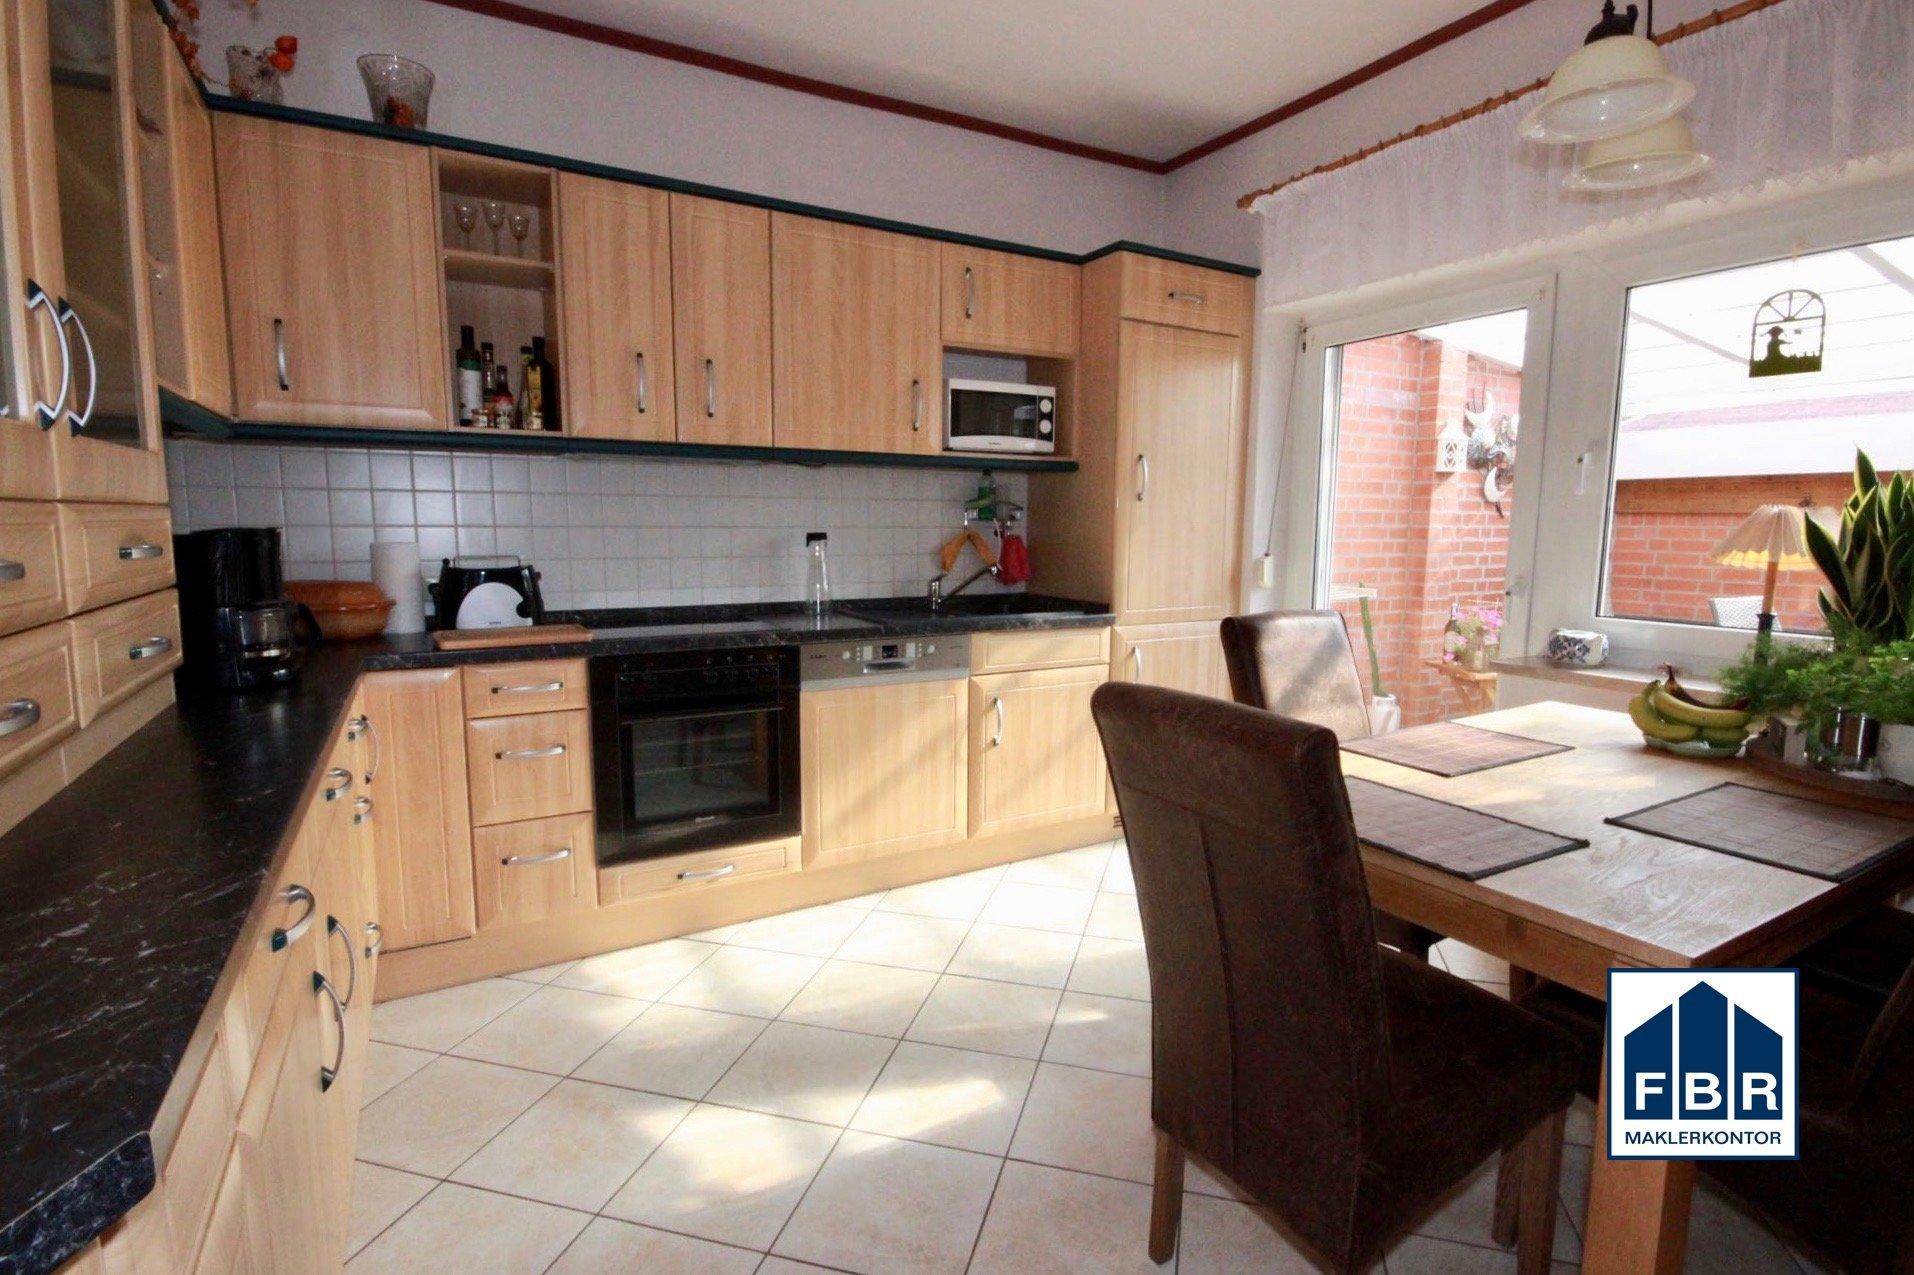 Küche - Zugang Terrasse